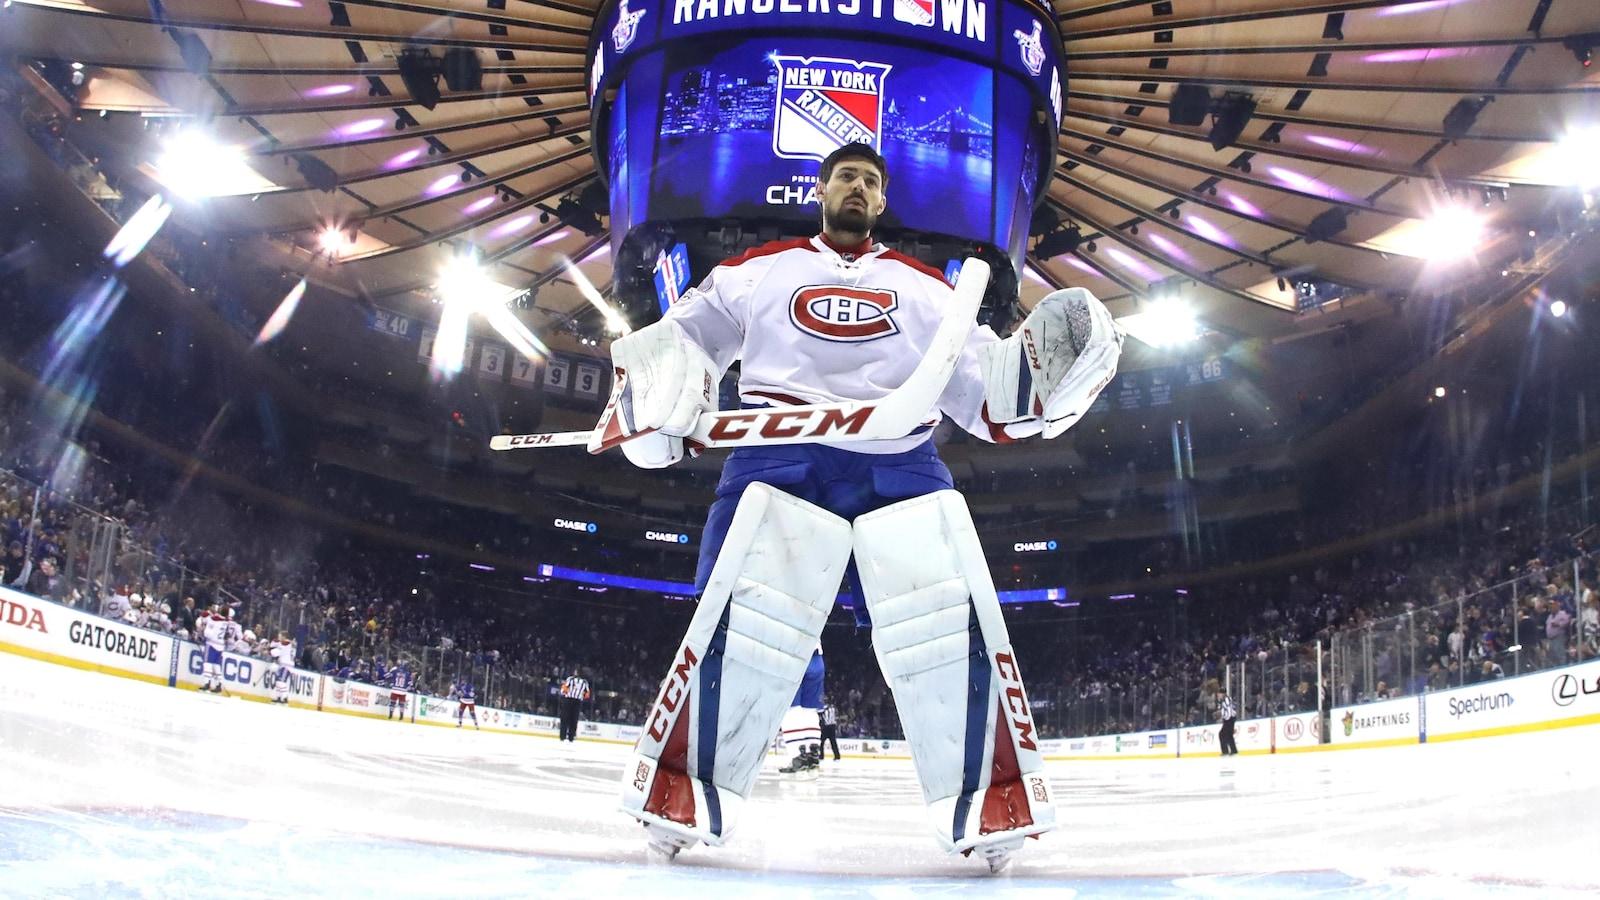 Le Canadien acquiert Jordan Weal | RICHARD LABBÉ | Hockey